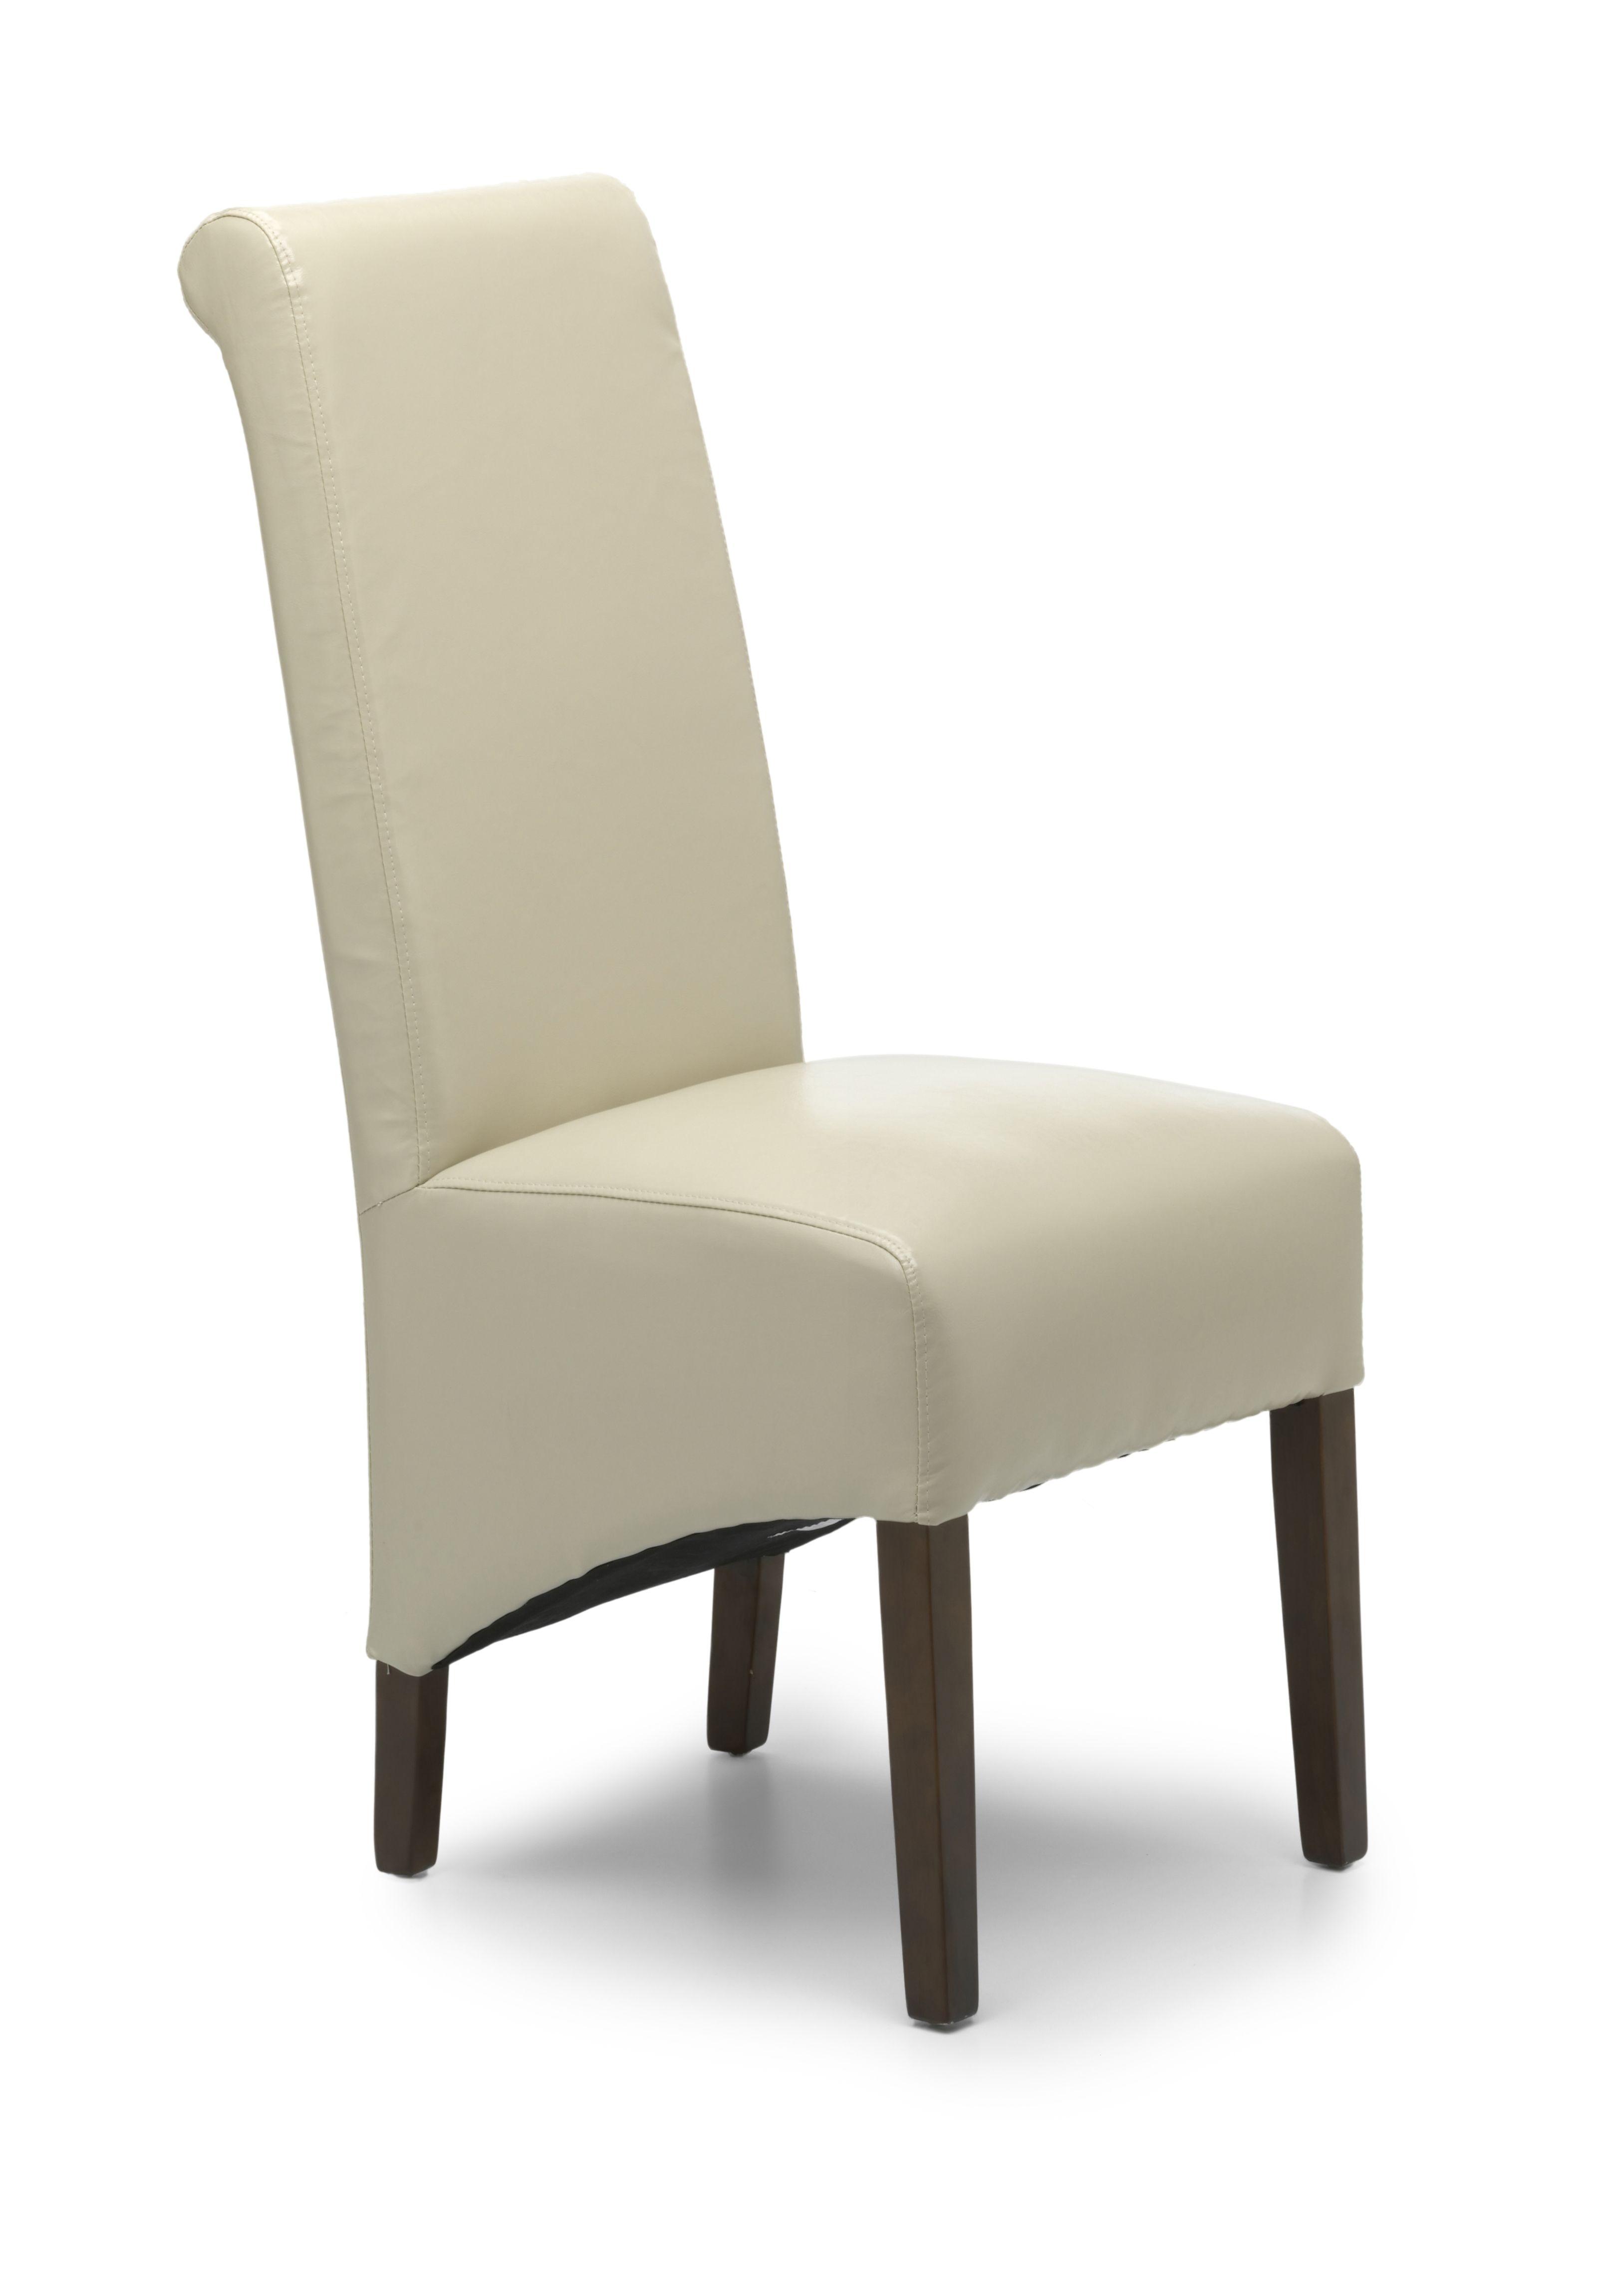 Krista Dark Walnut Dining Chair Set Of 2 Walnut Dining